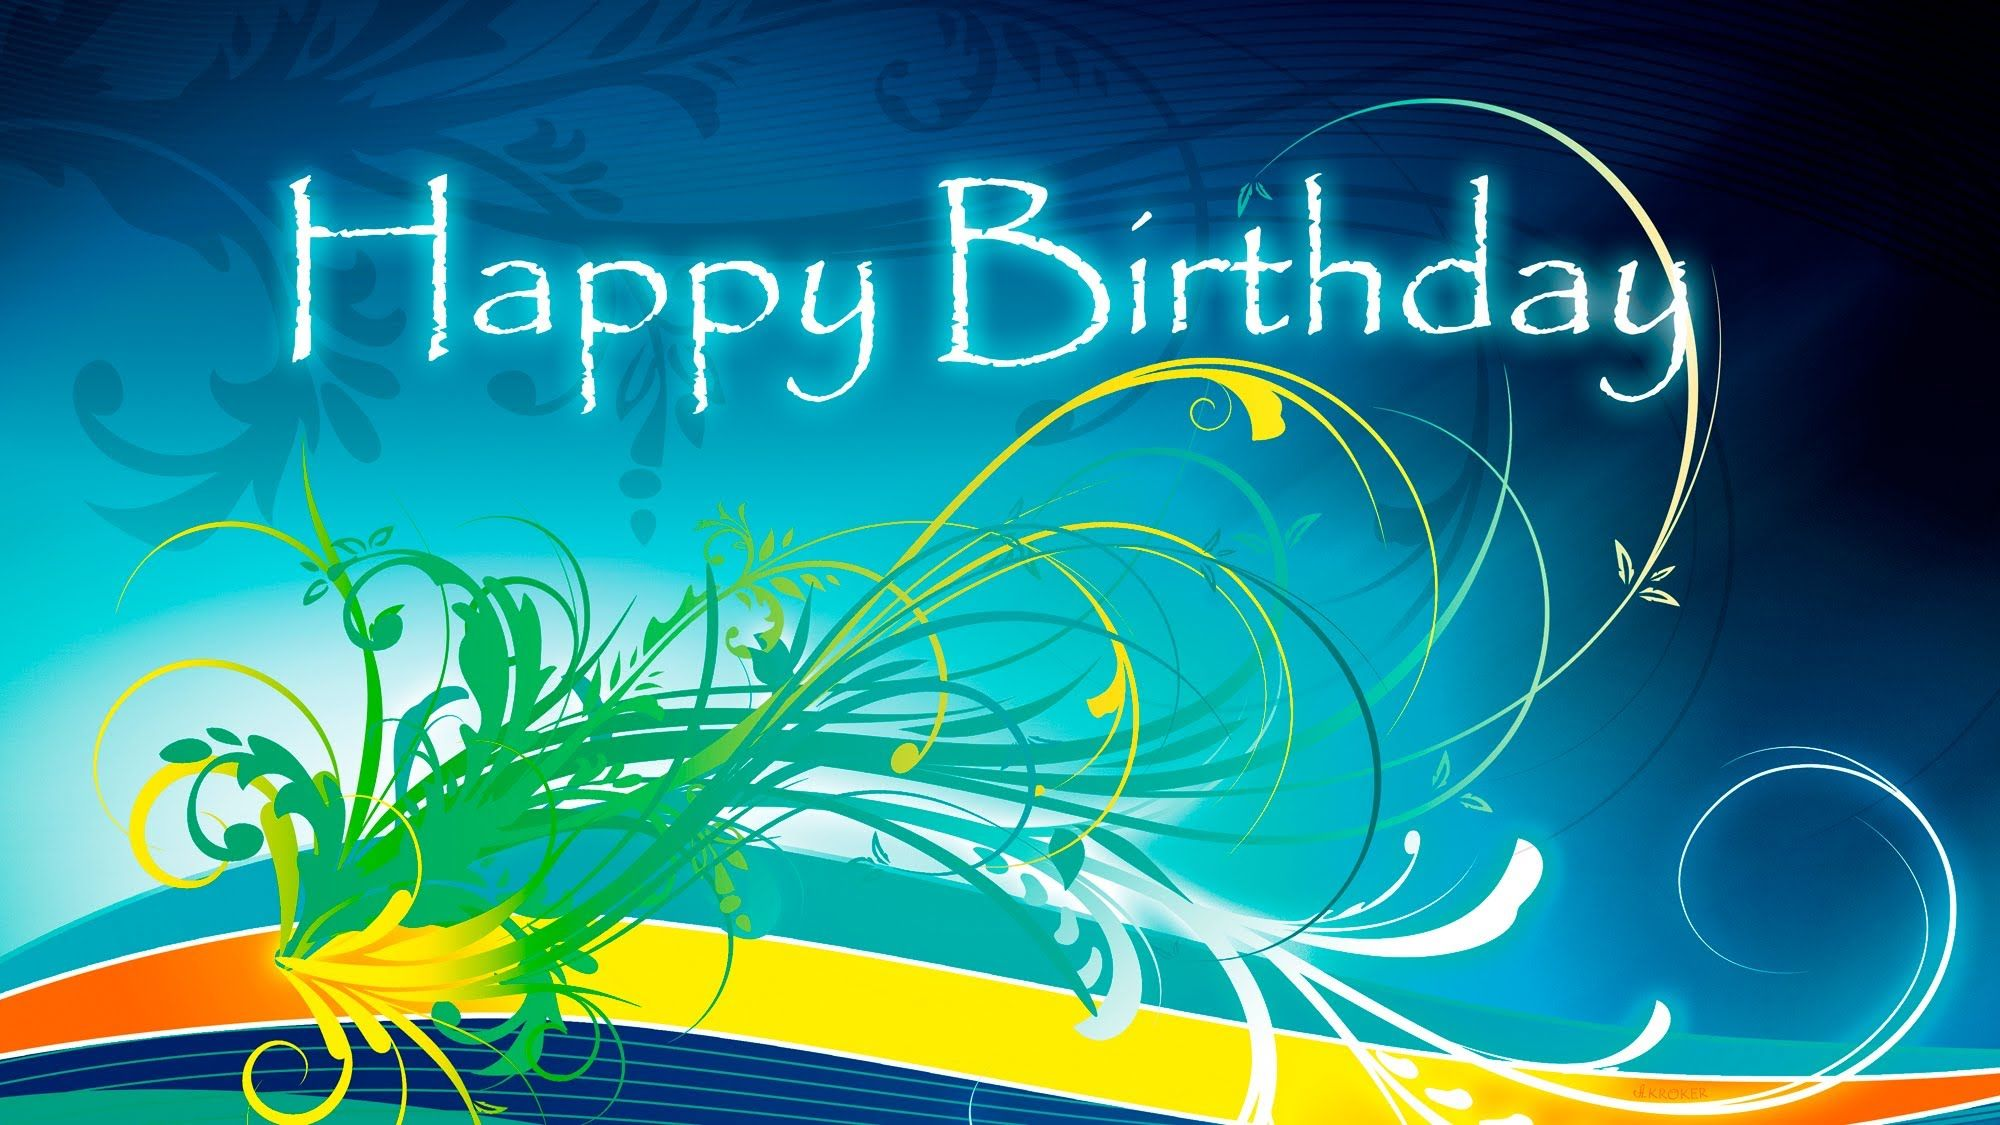 Pin By Wanda West On Birthday Gifs Pinterest Happy Birthday And